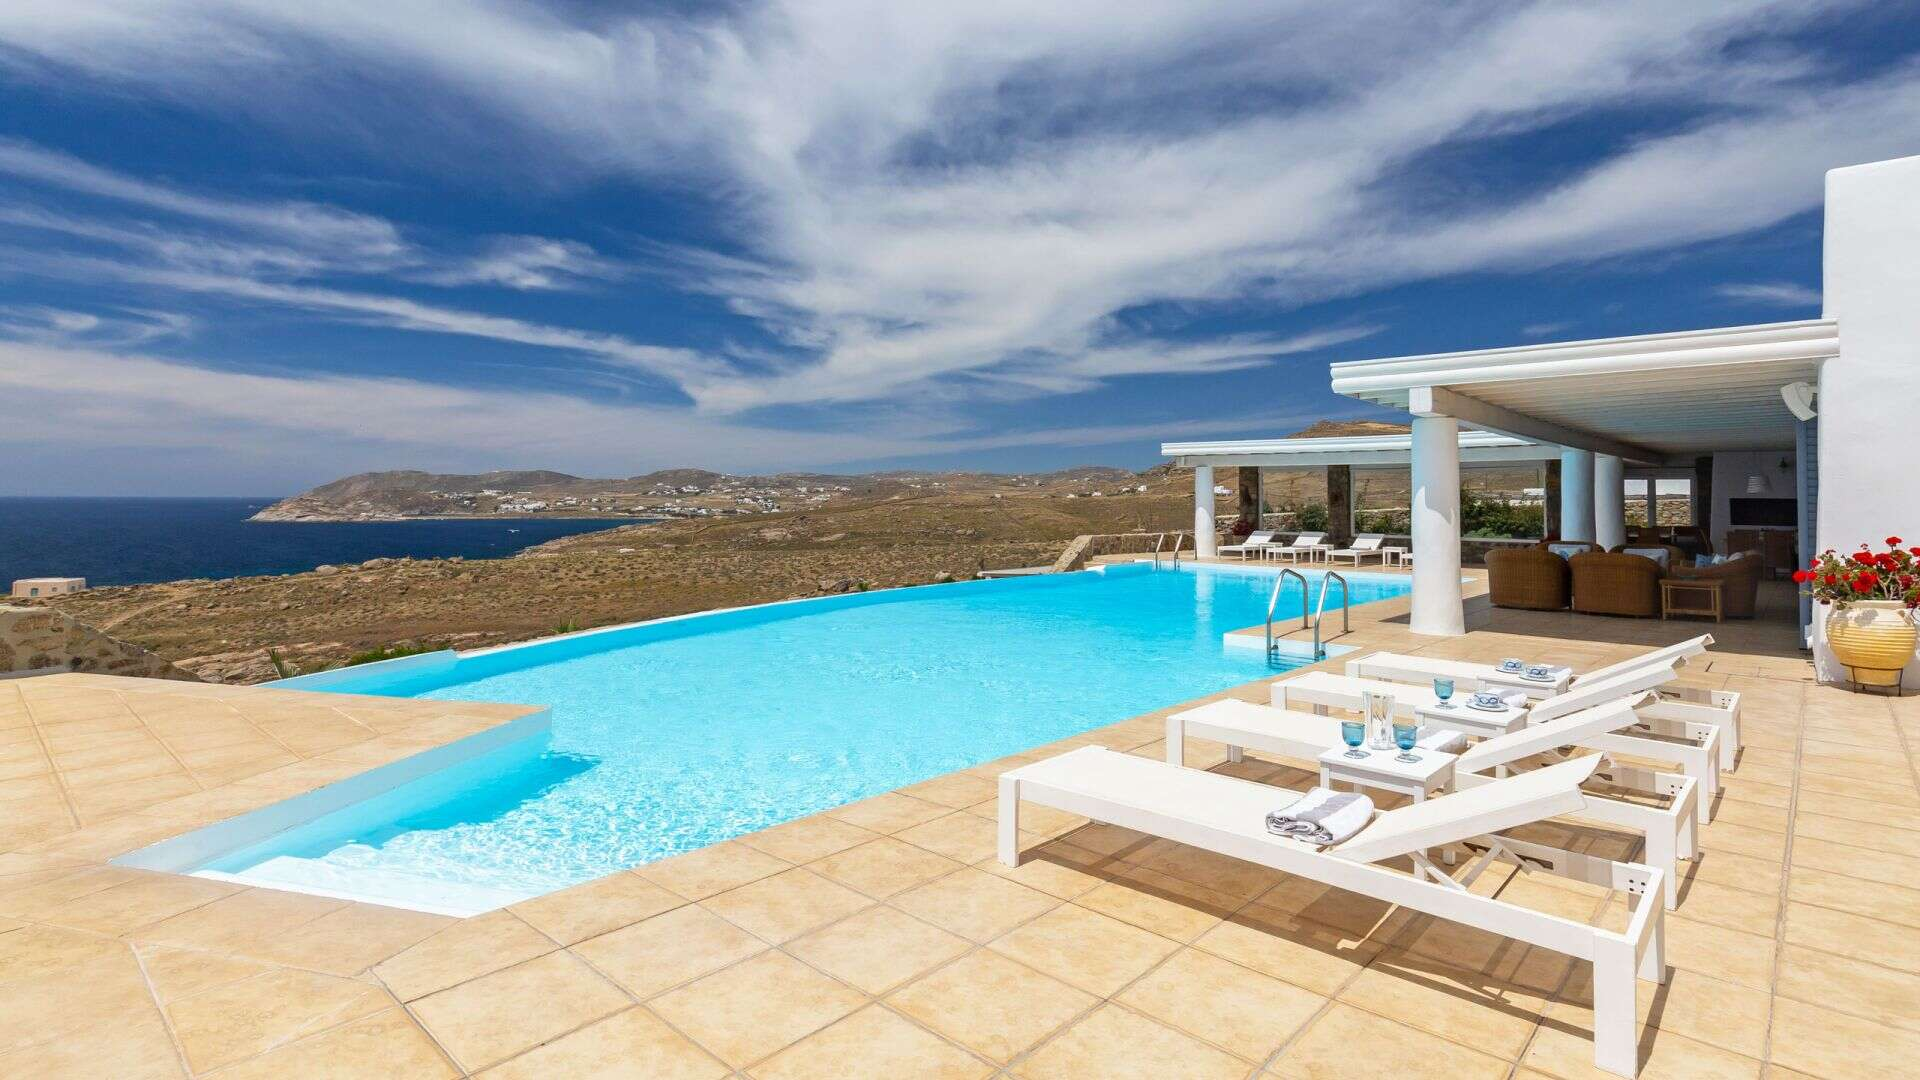 Luxury vacation rentals europe - Greece - Mykonos - Lia - Aegean Horizon - Image 1/25